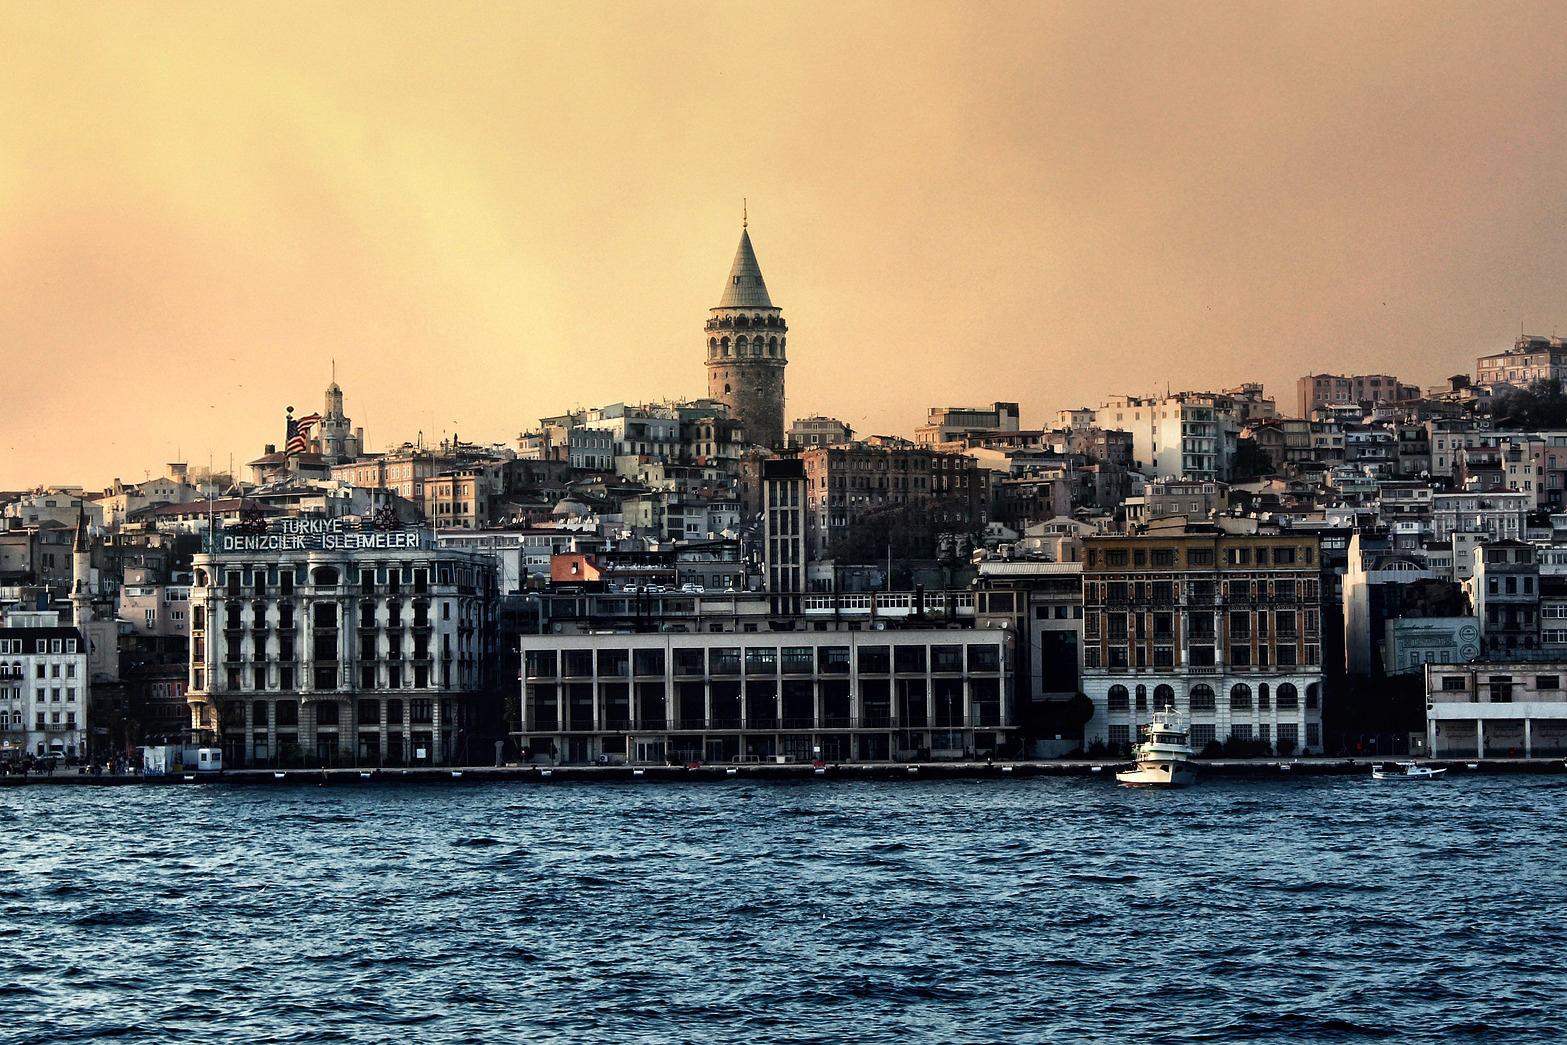 istanbul-1084458_1920-1.jpg